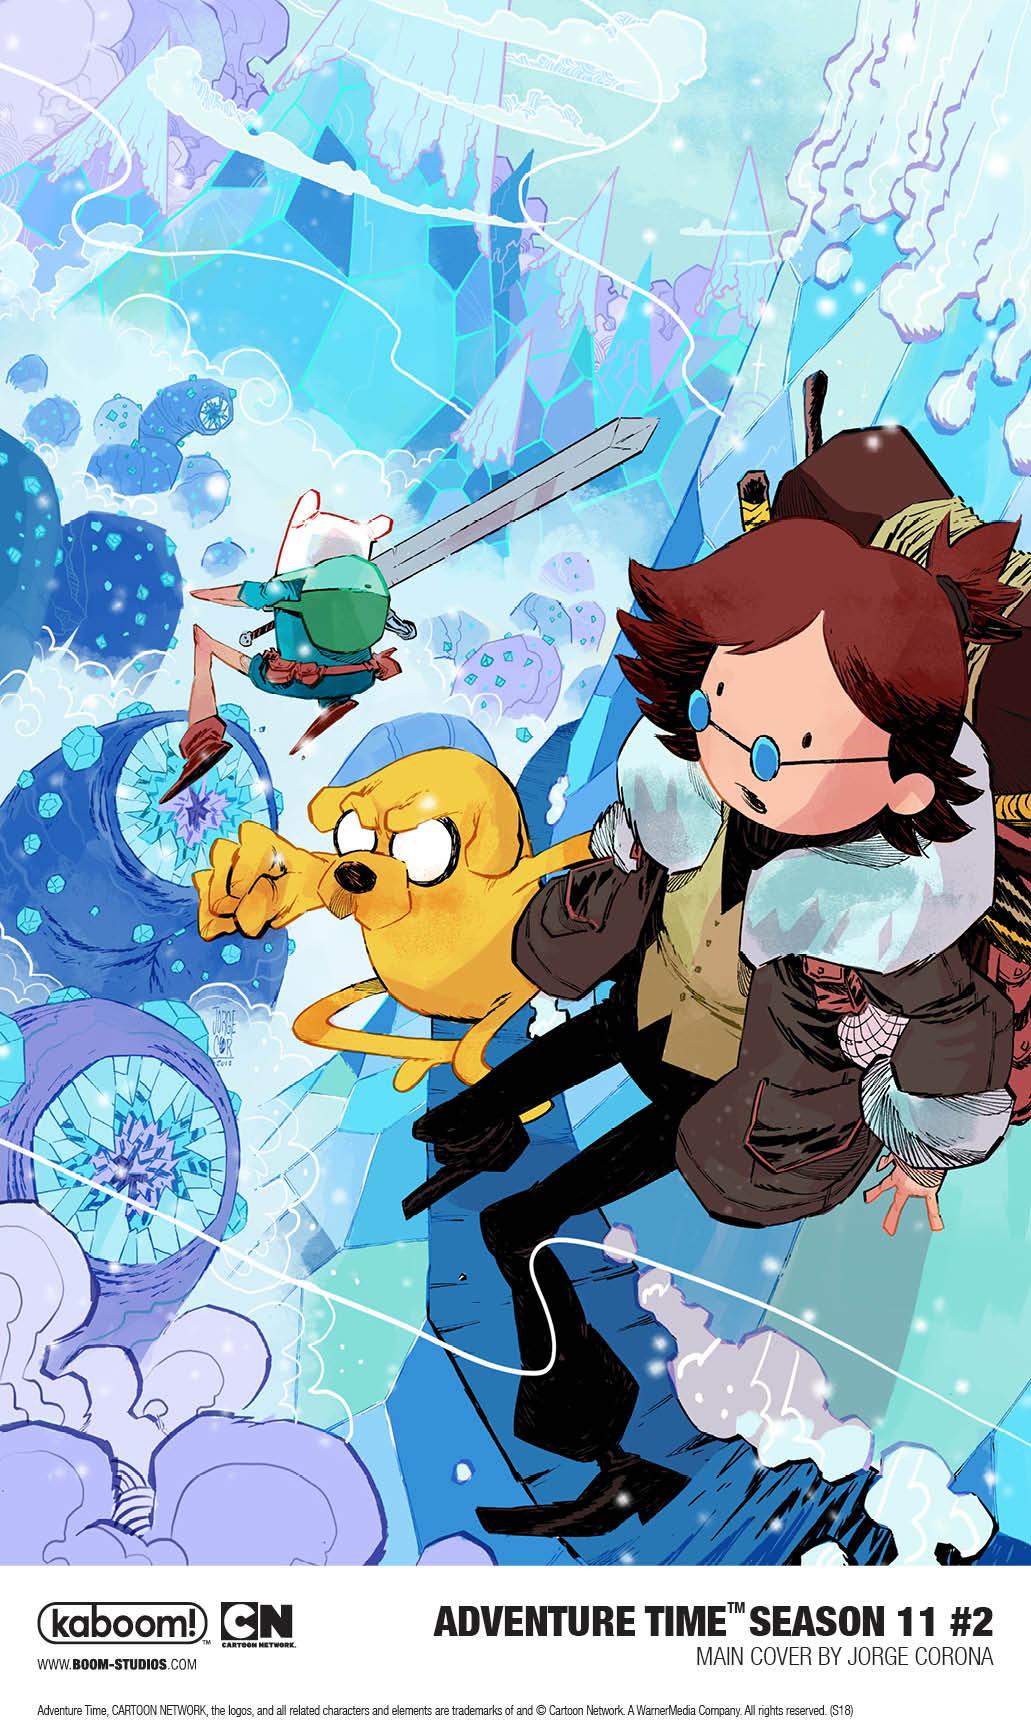 Adventure Time Season 11 #2 (2019)